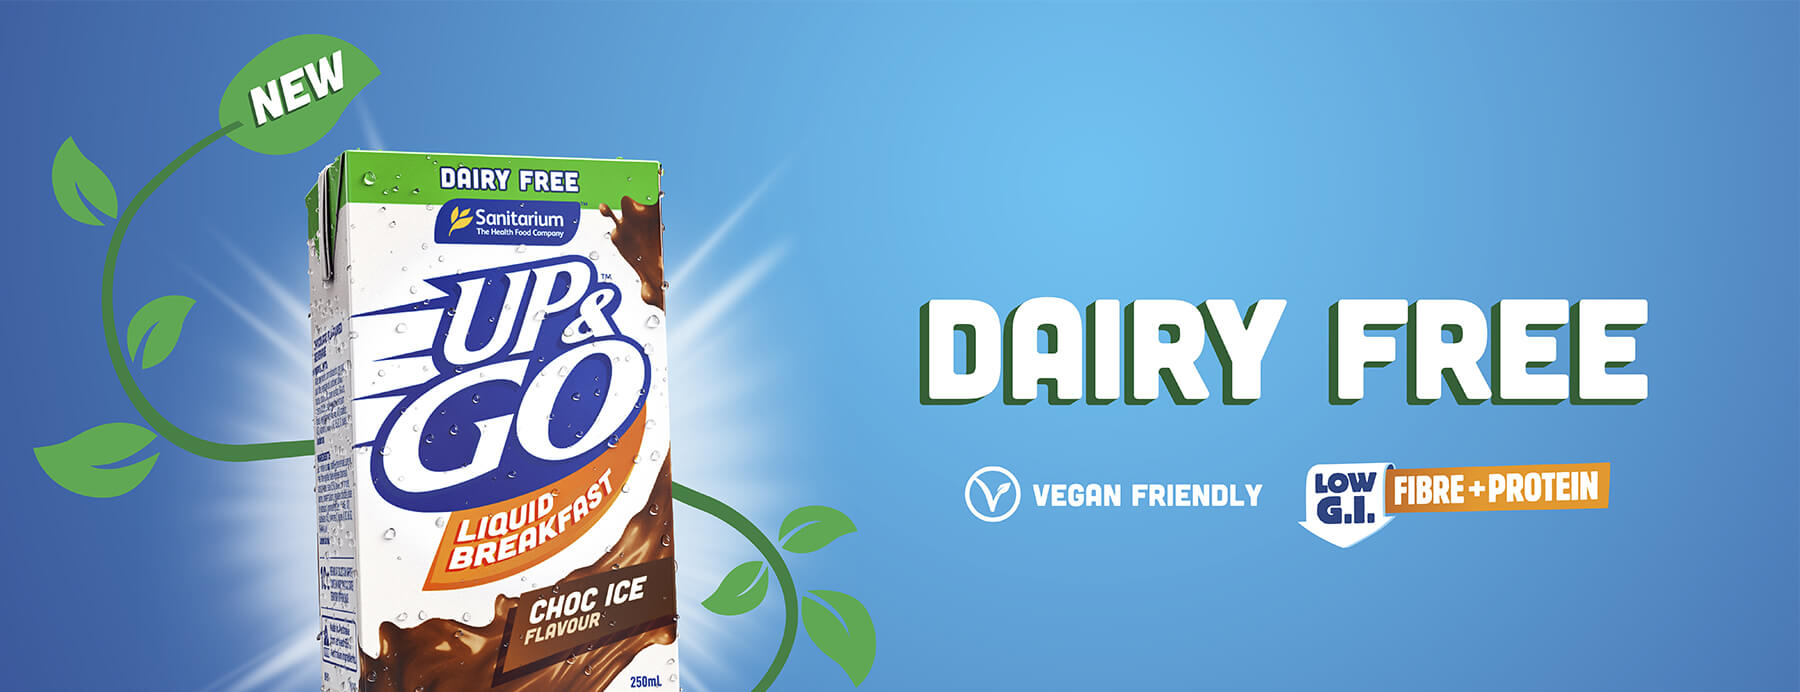 UP&GO Dairy Free